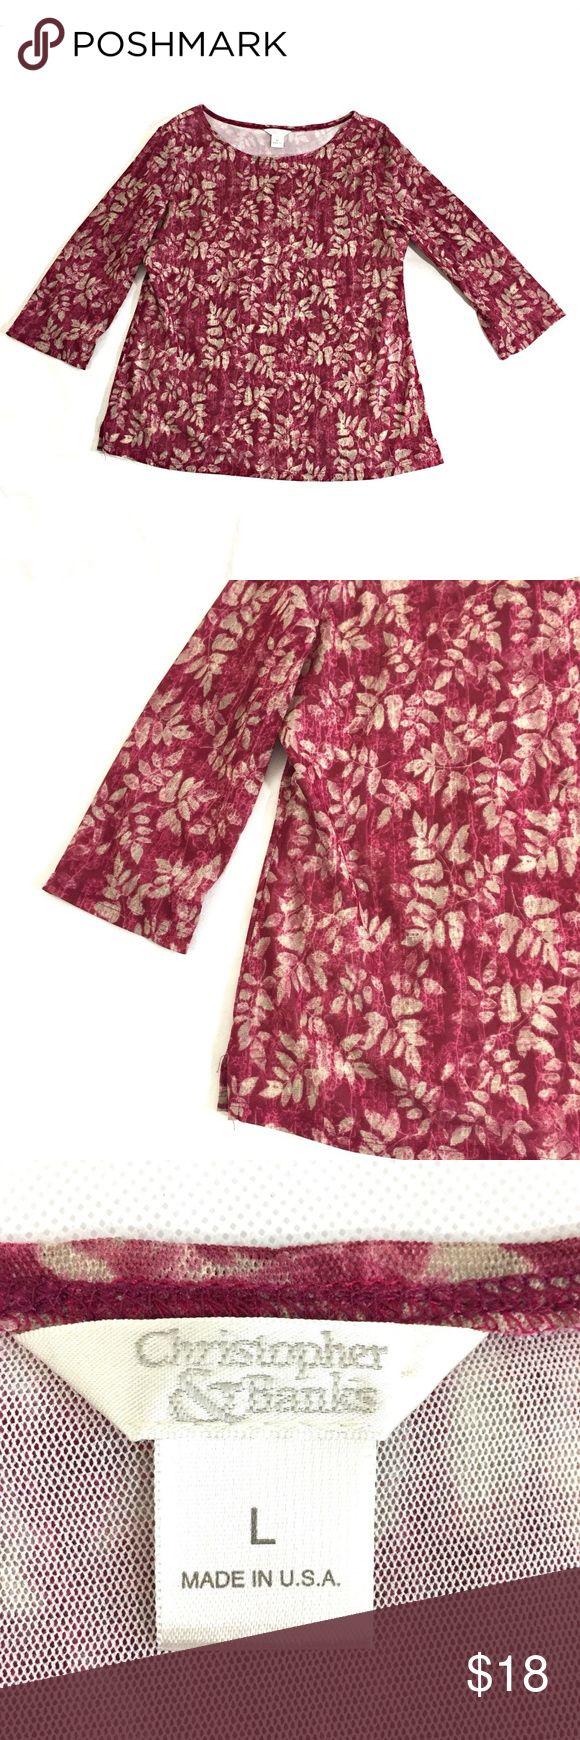 "Christopher & Banks Top Size L 3/4 Sleeve Christopher & Banks Women's Top Size L  3/4 Sleeve  Leaf Print On Plum  Lined   Sheer Sleeves Side Splits 100% Polyester Length: 23.75""   Armpit to armpit: 19.25"" Christopher & Banks Tops Blouses"